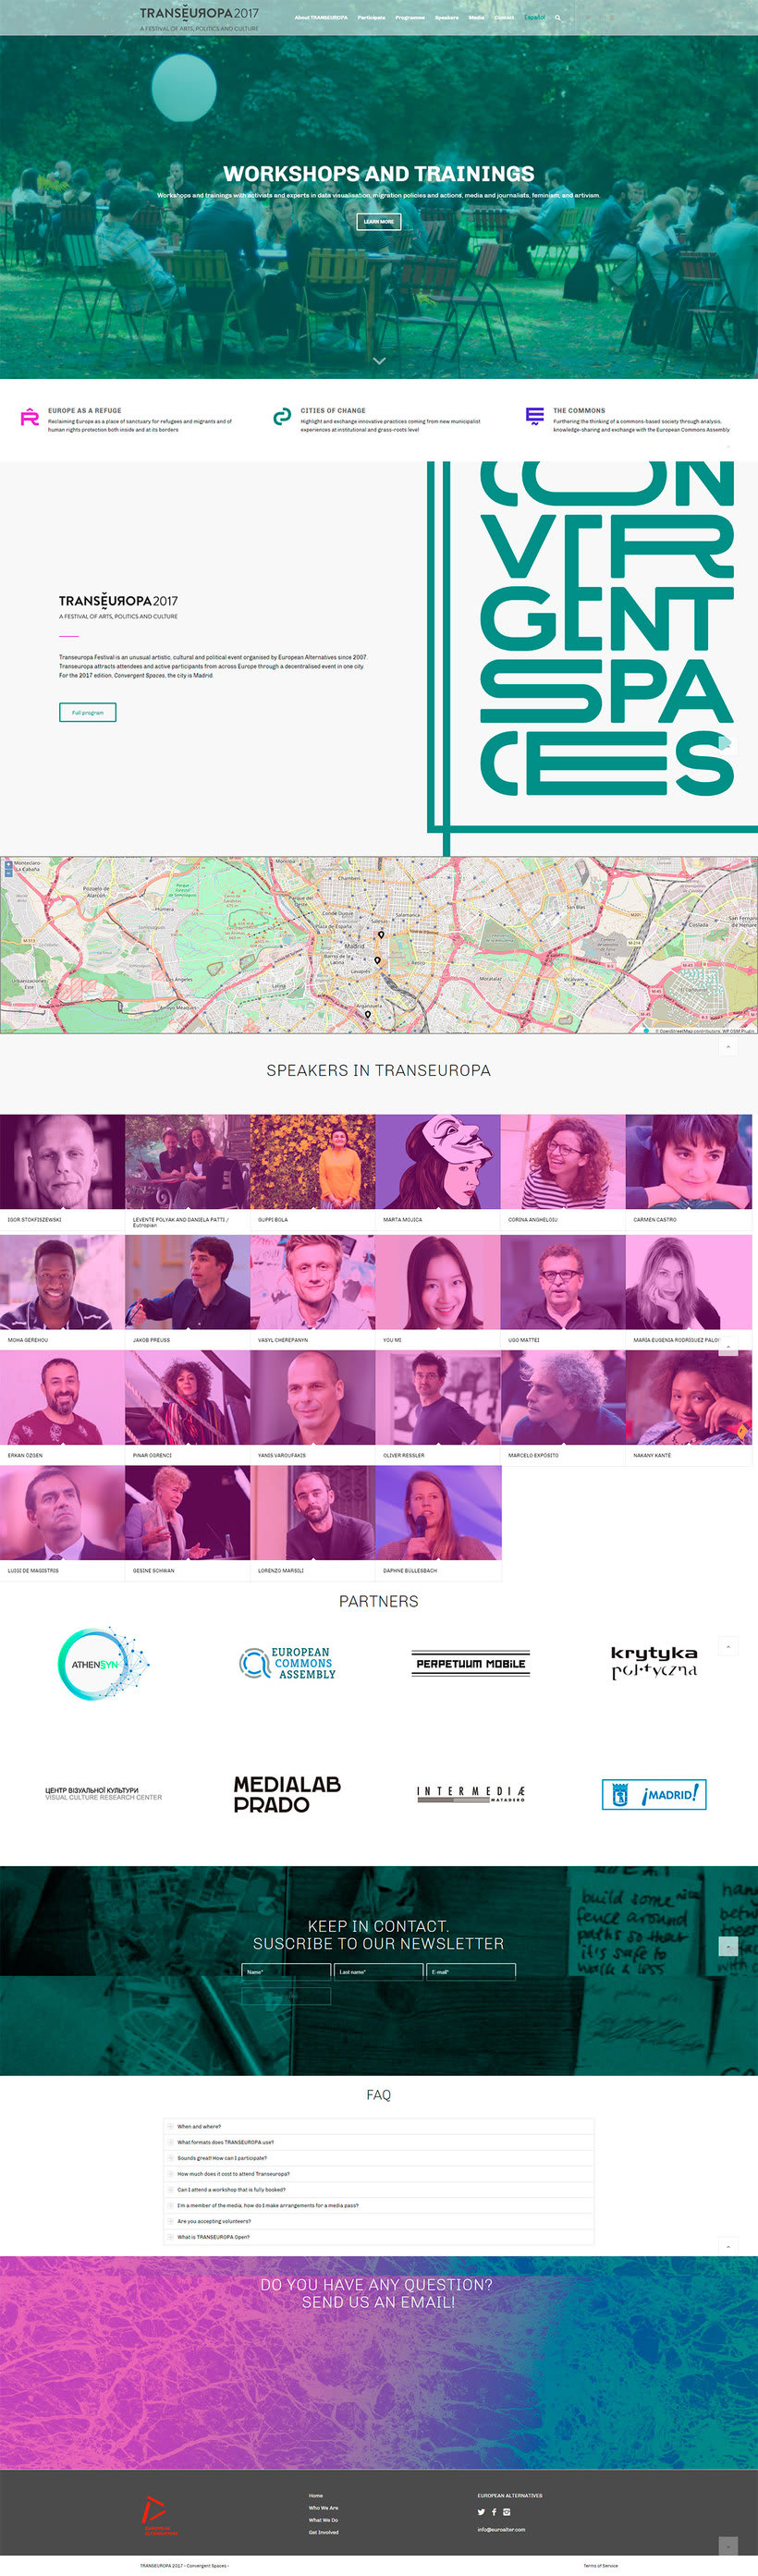 Trans Europa festival 1